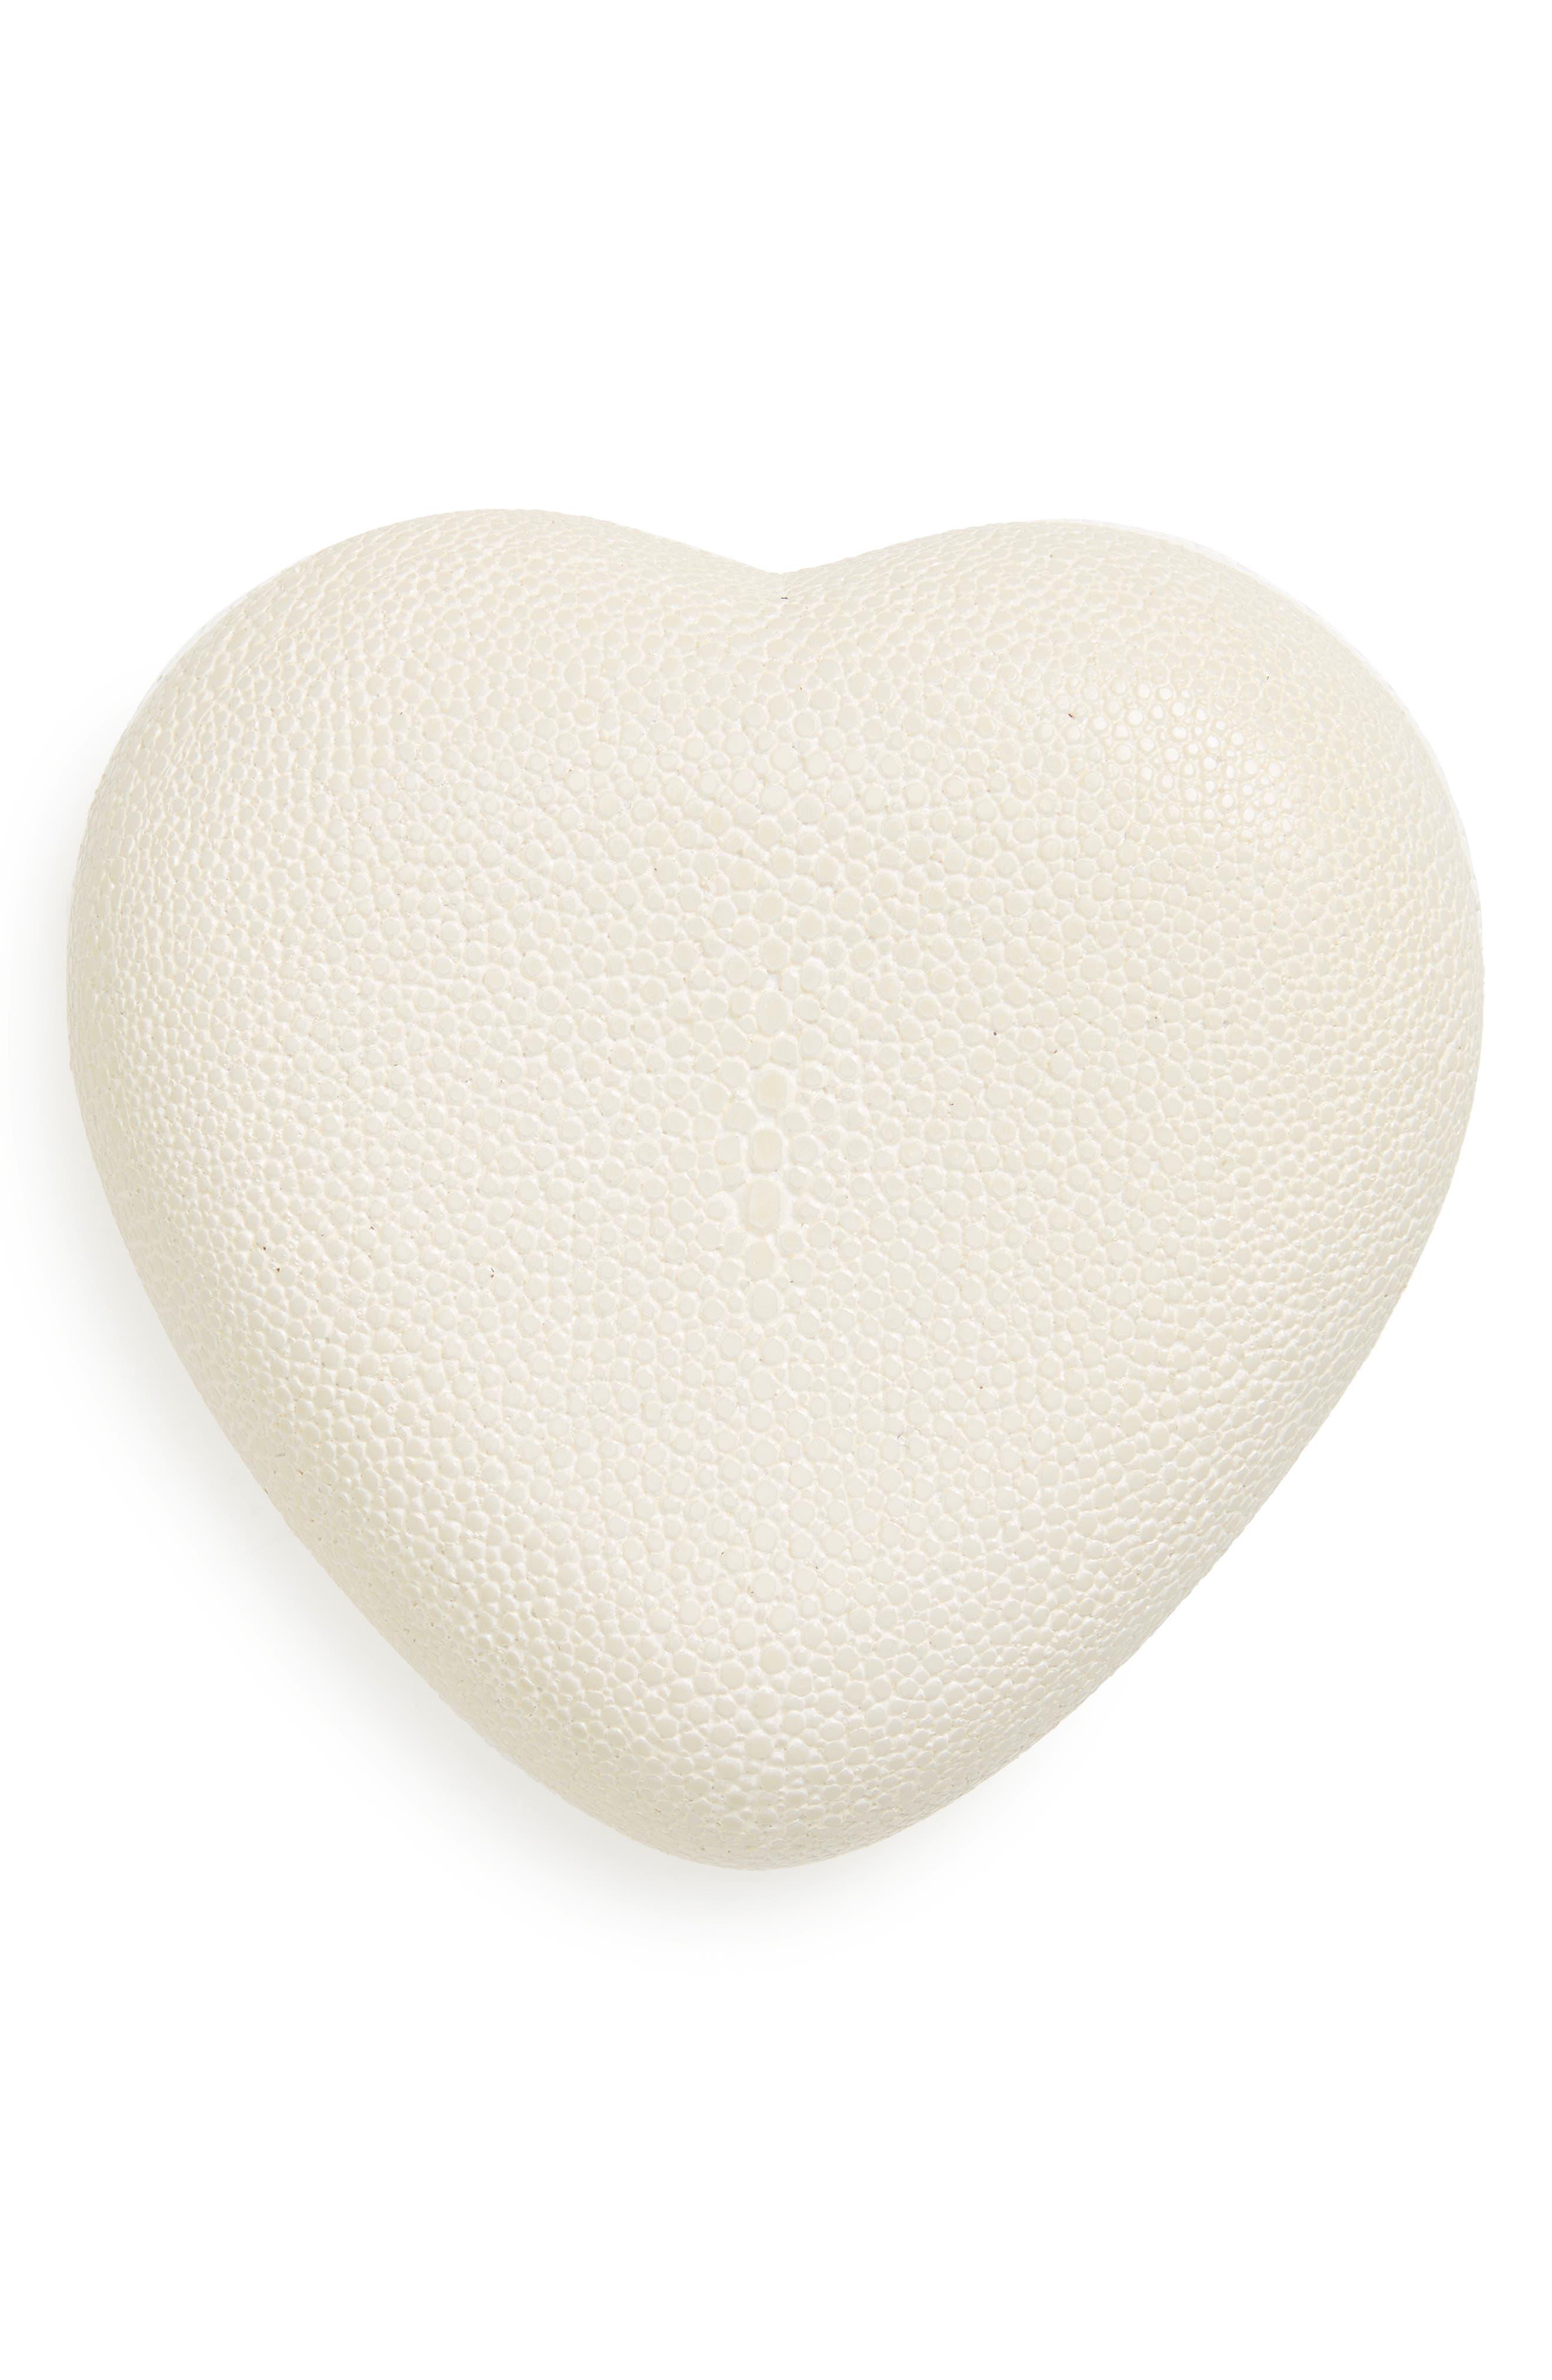 Alternate Image 1 Selected - AERIN Shagreen Heart Box